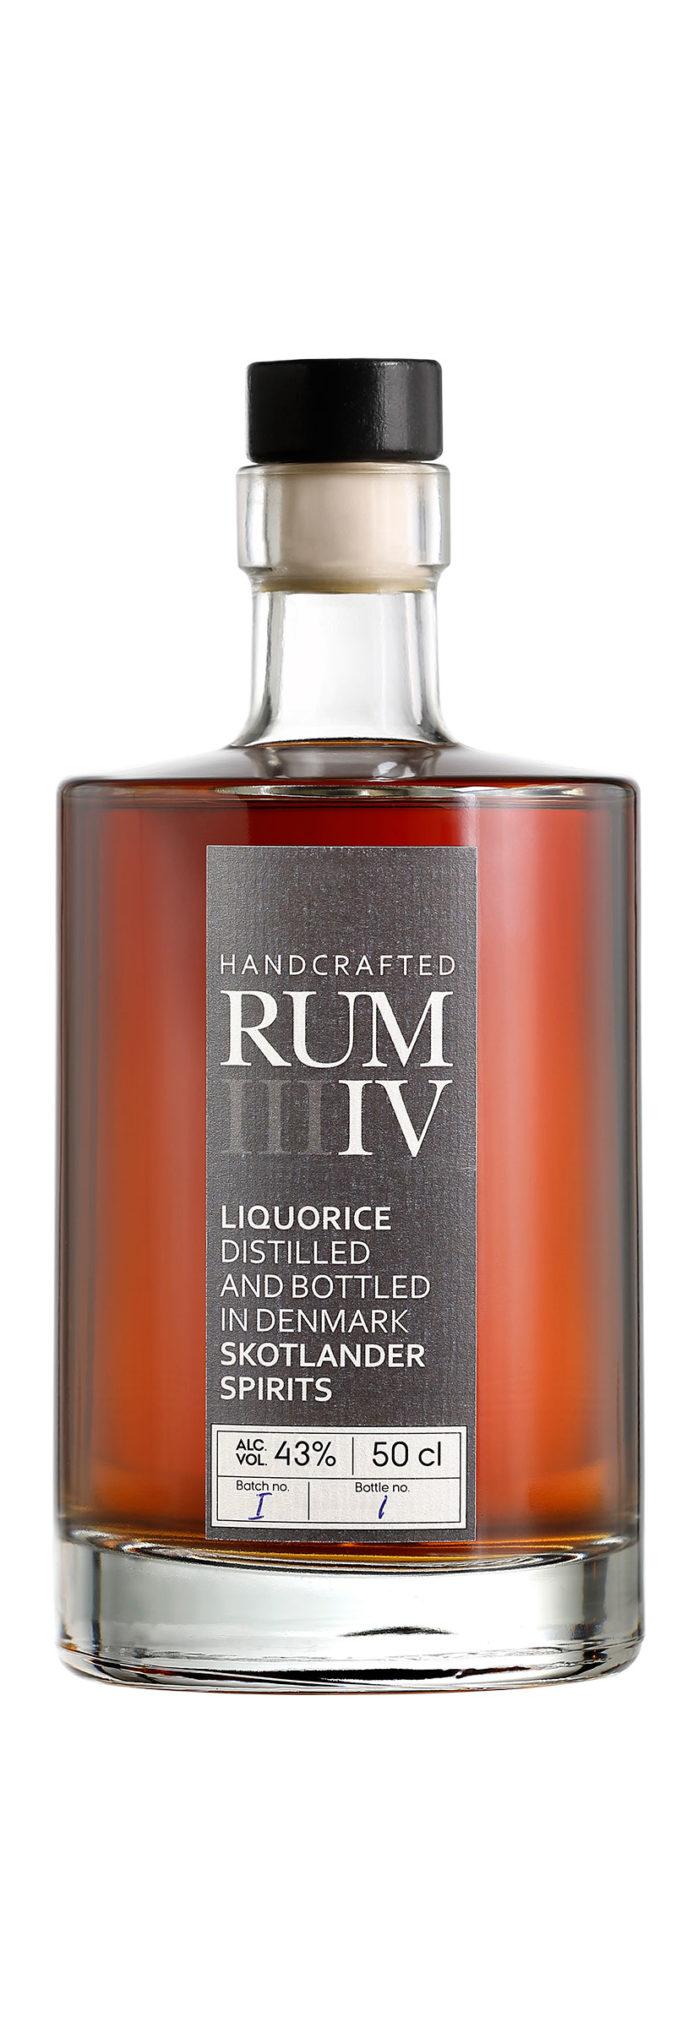 Skotlander Liquorice rum from Denmark